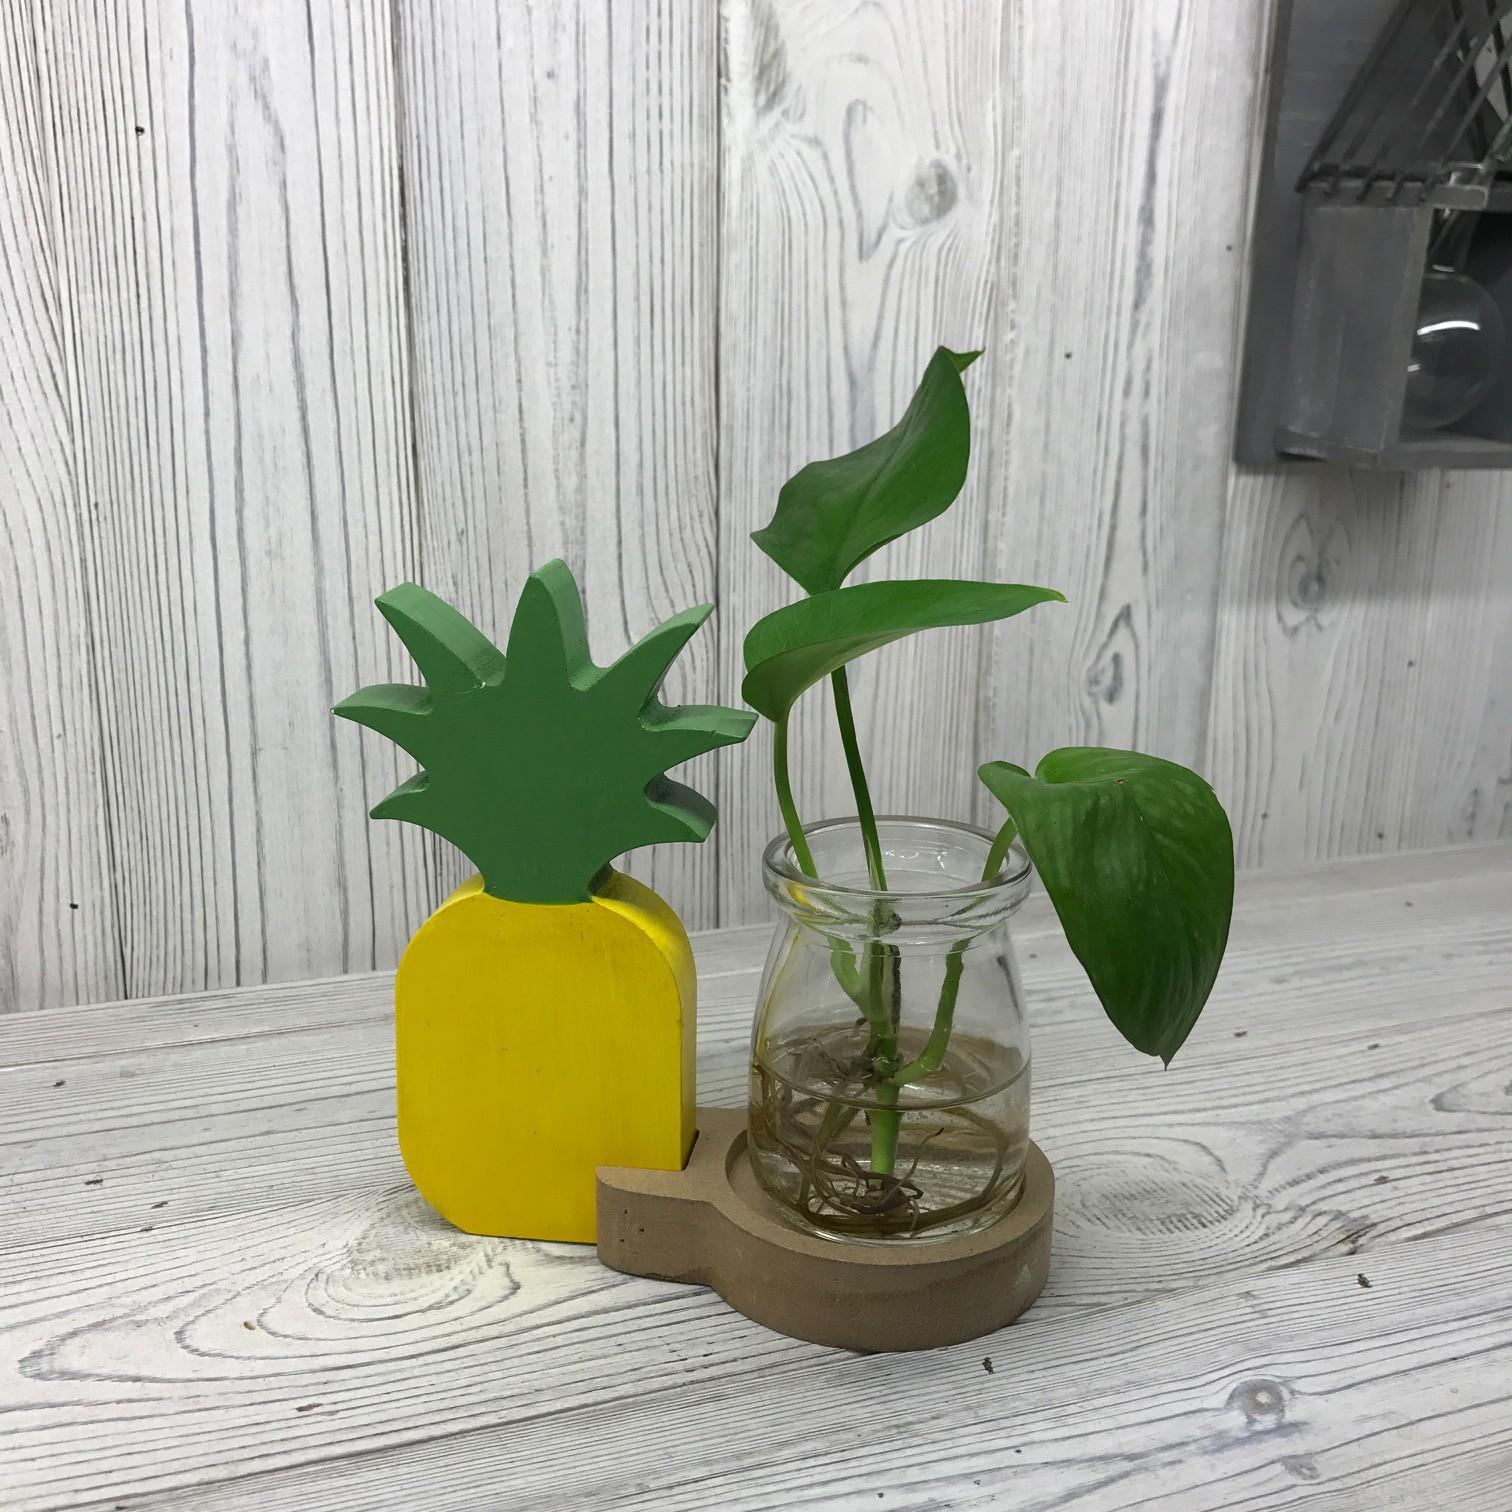 Hydroponic Home Decor Pineapple Pot